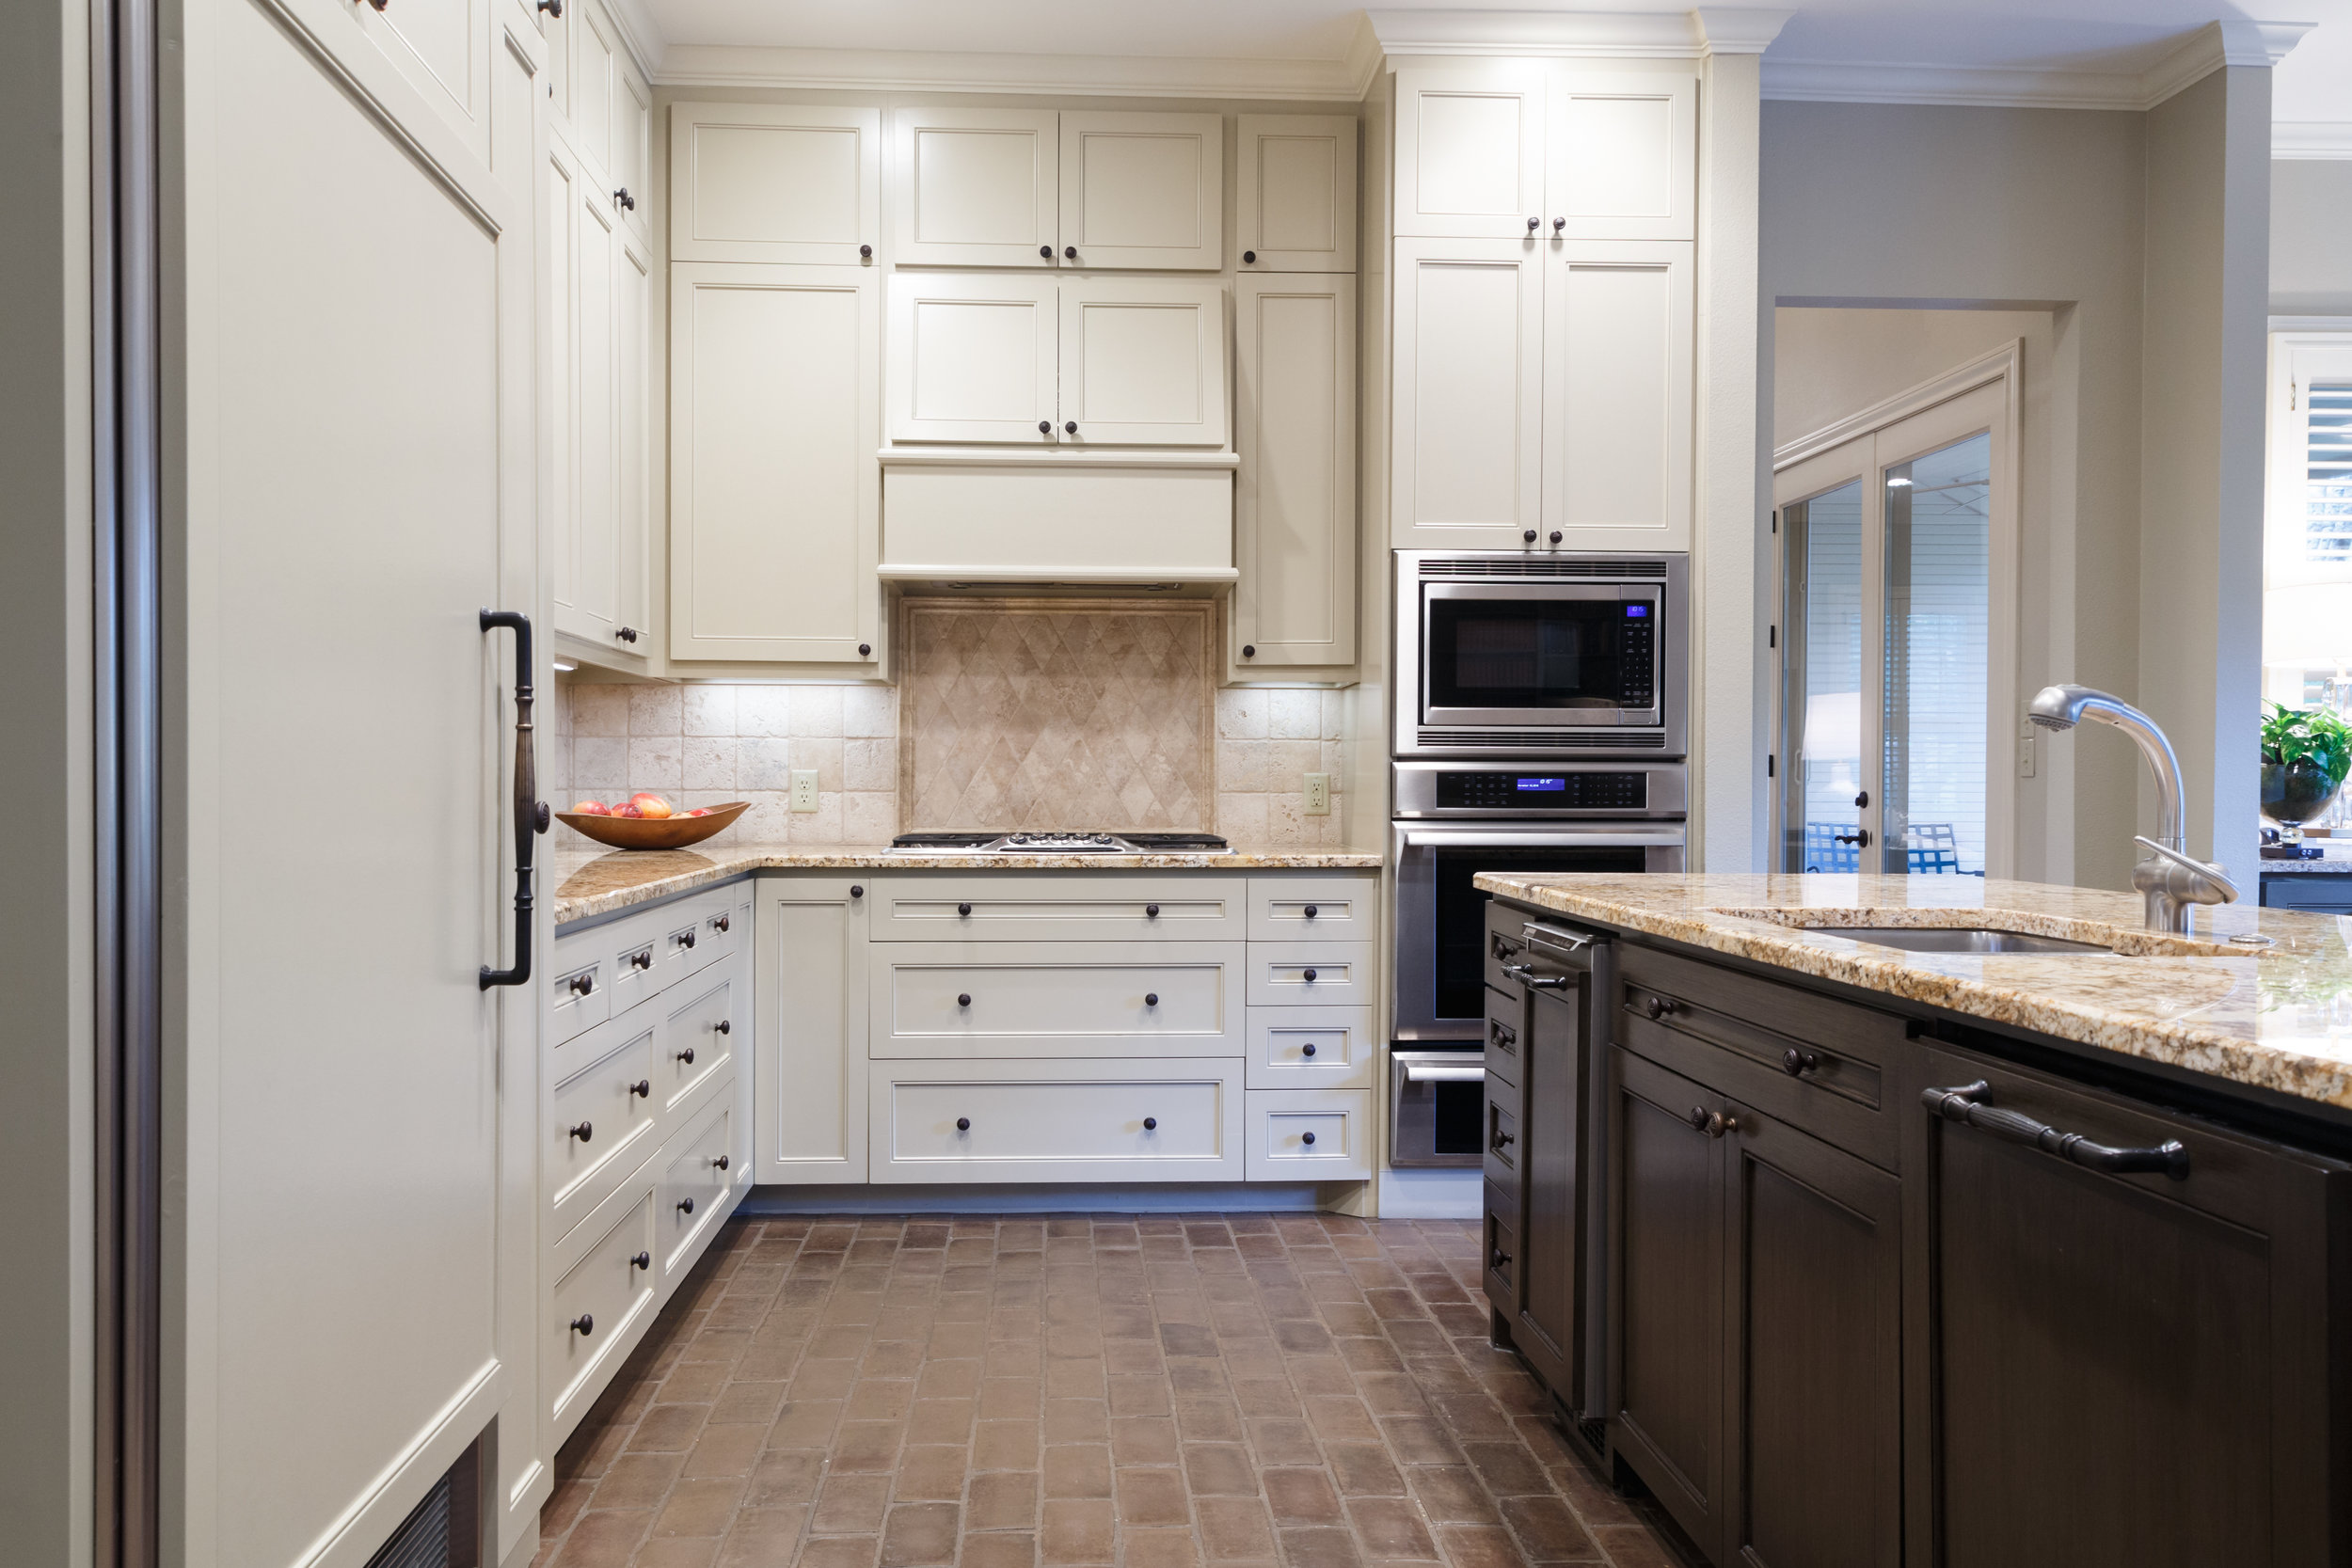 Westlake Re-painted Kitchen